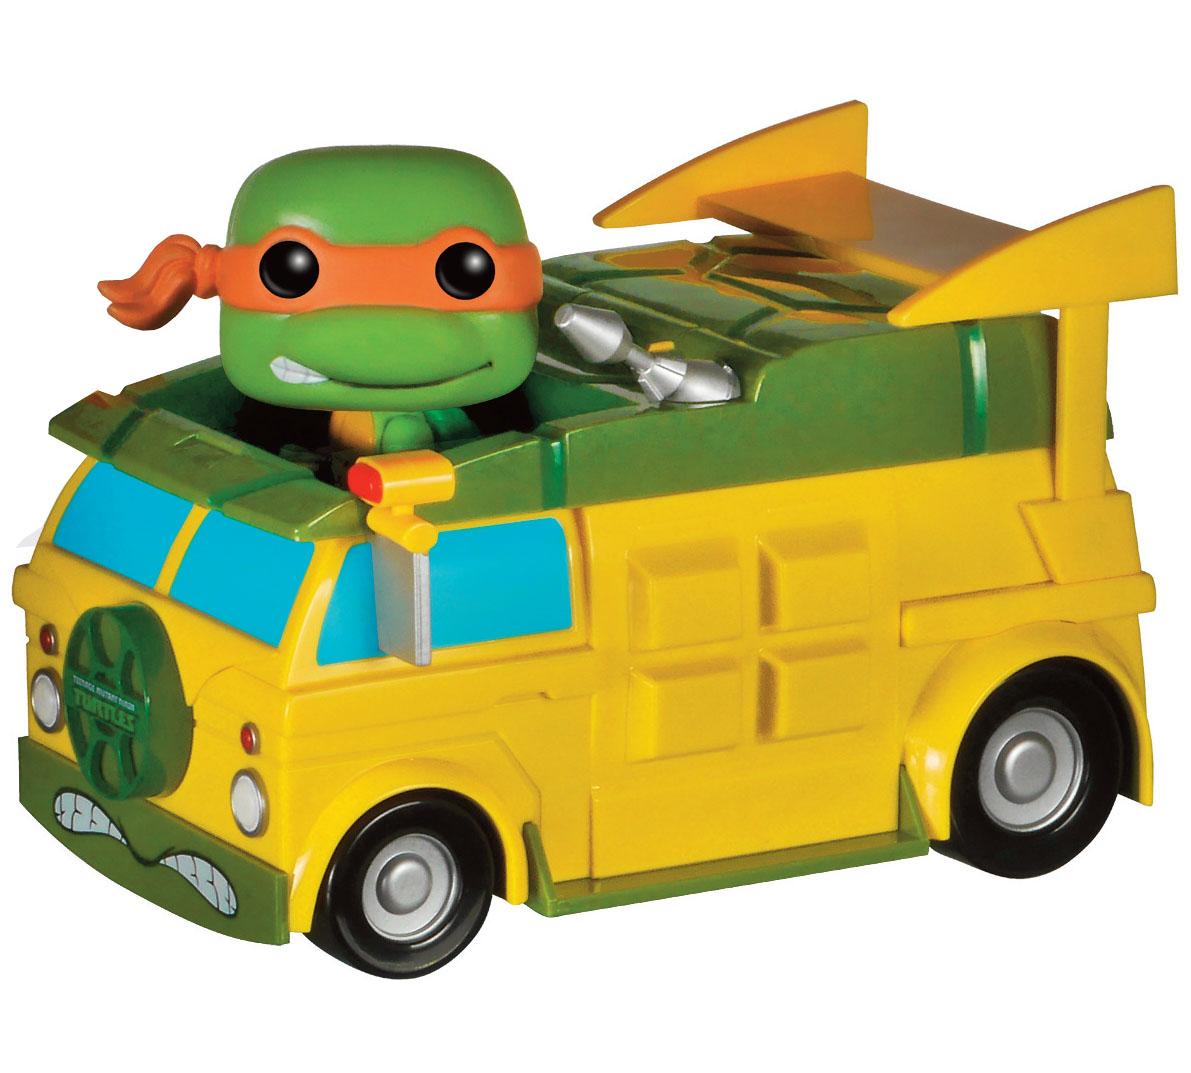 funko-pop-rides-tmnt-turtle-van-toyslife